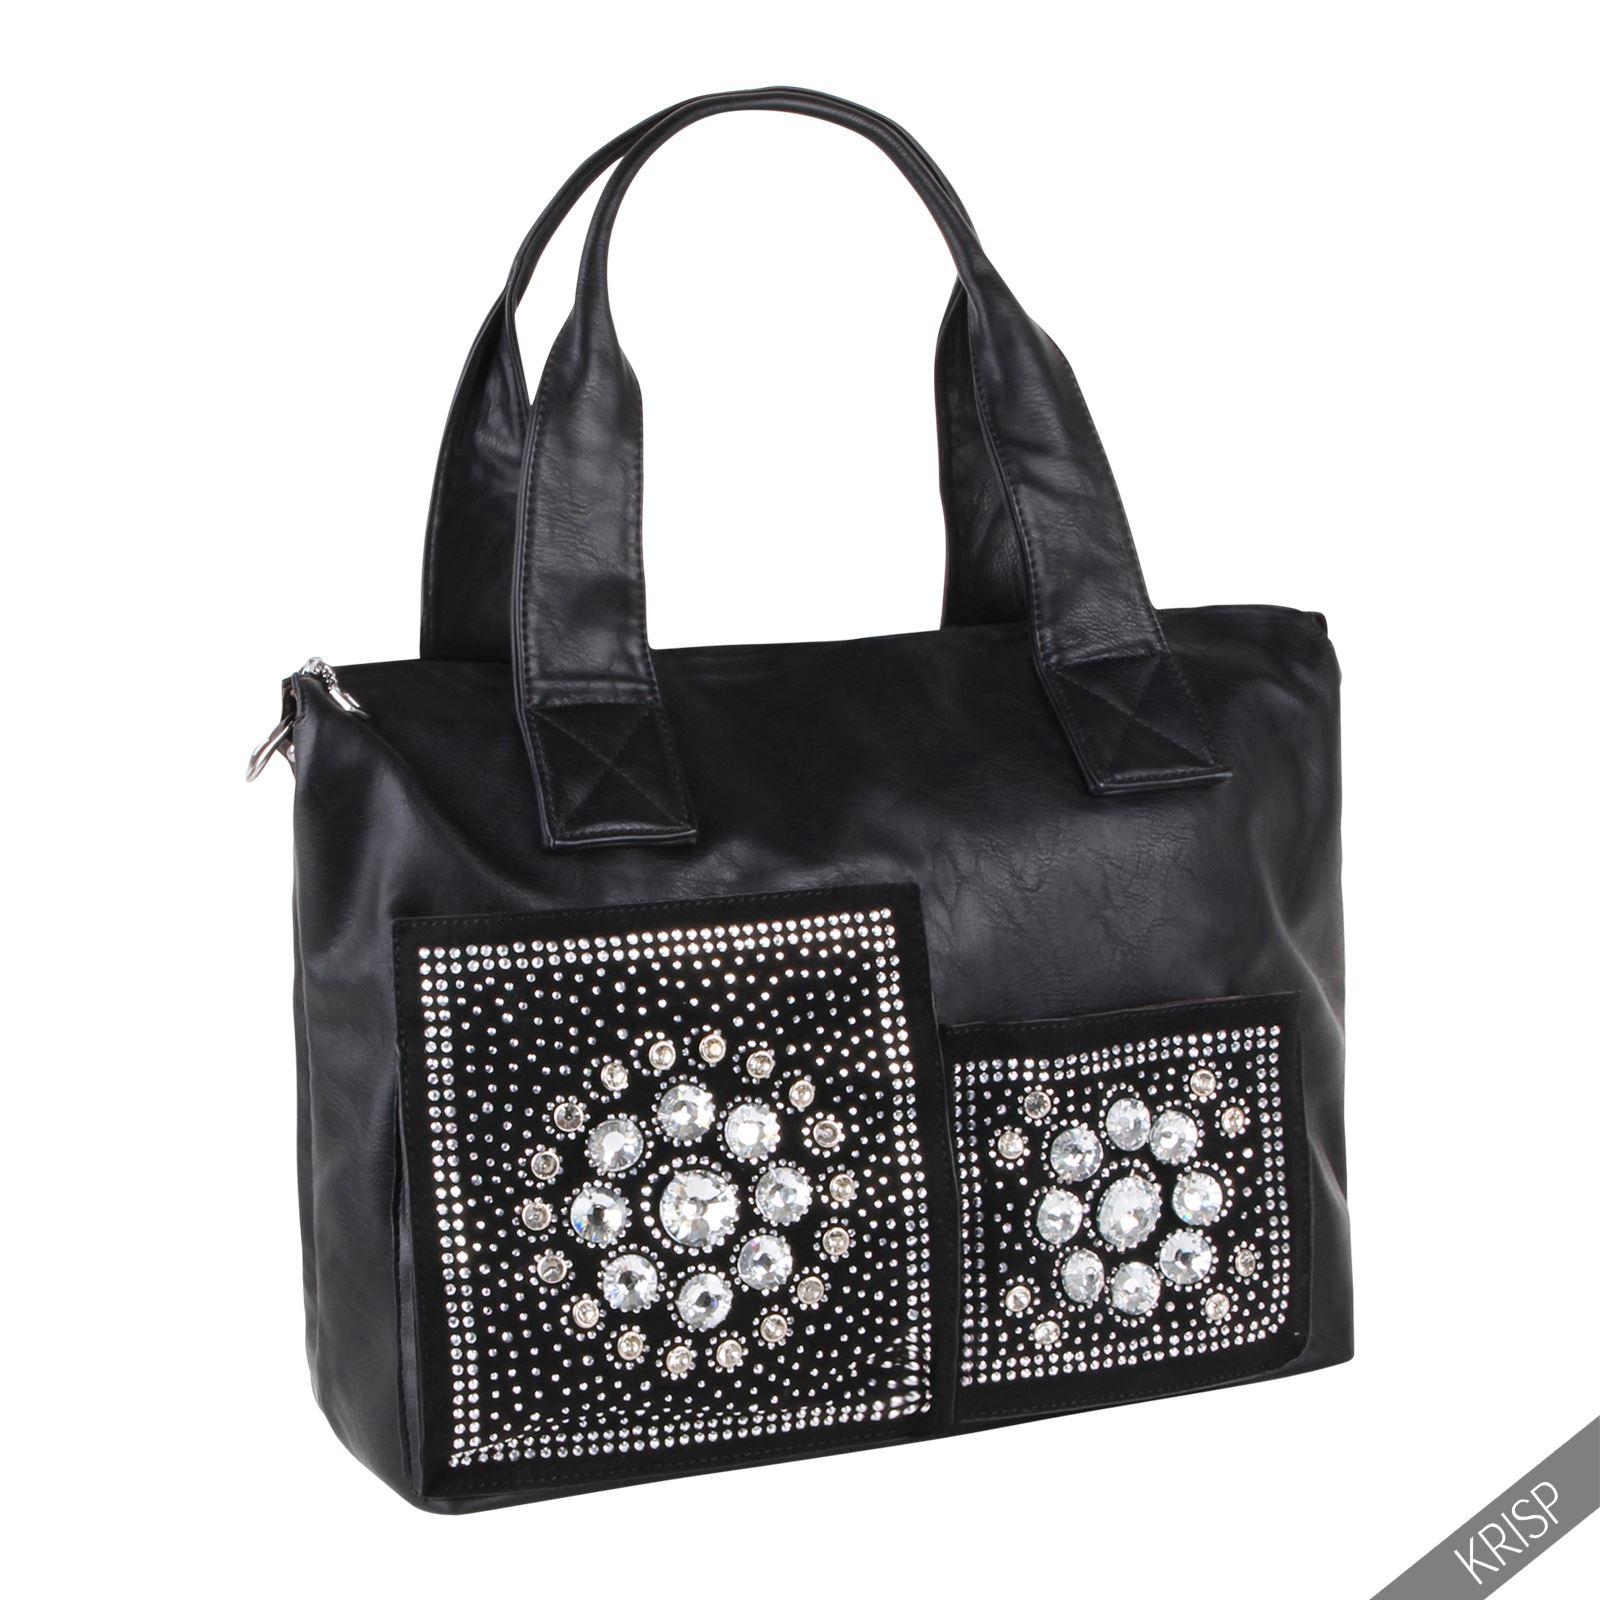 femmes sac main fourre tout sac shopping sac cabas grand. Black Bedroom Furniture Sets. Home Design Ideas